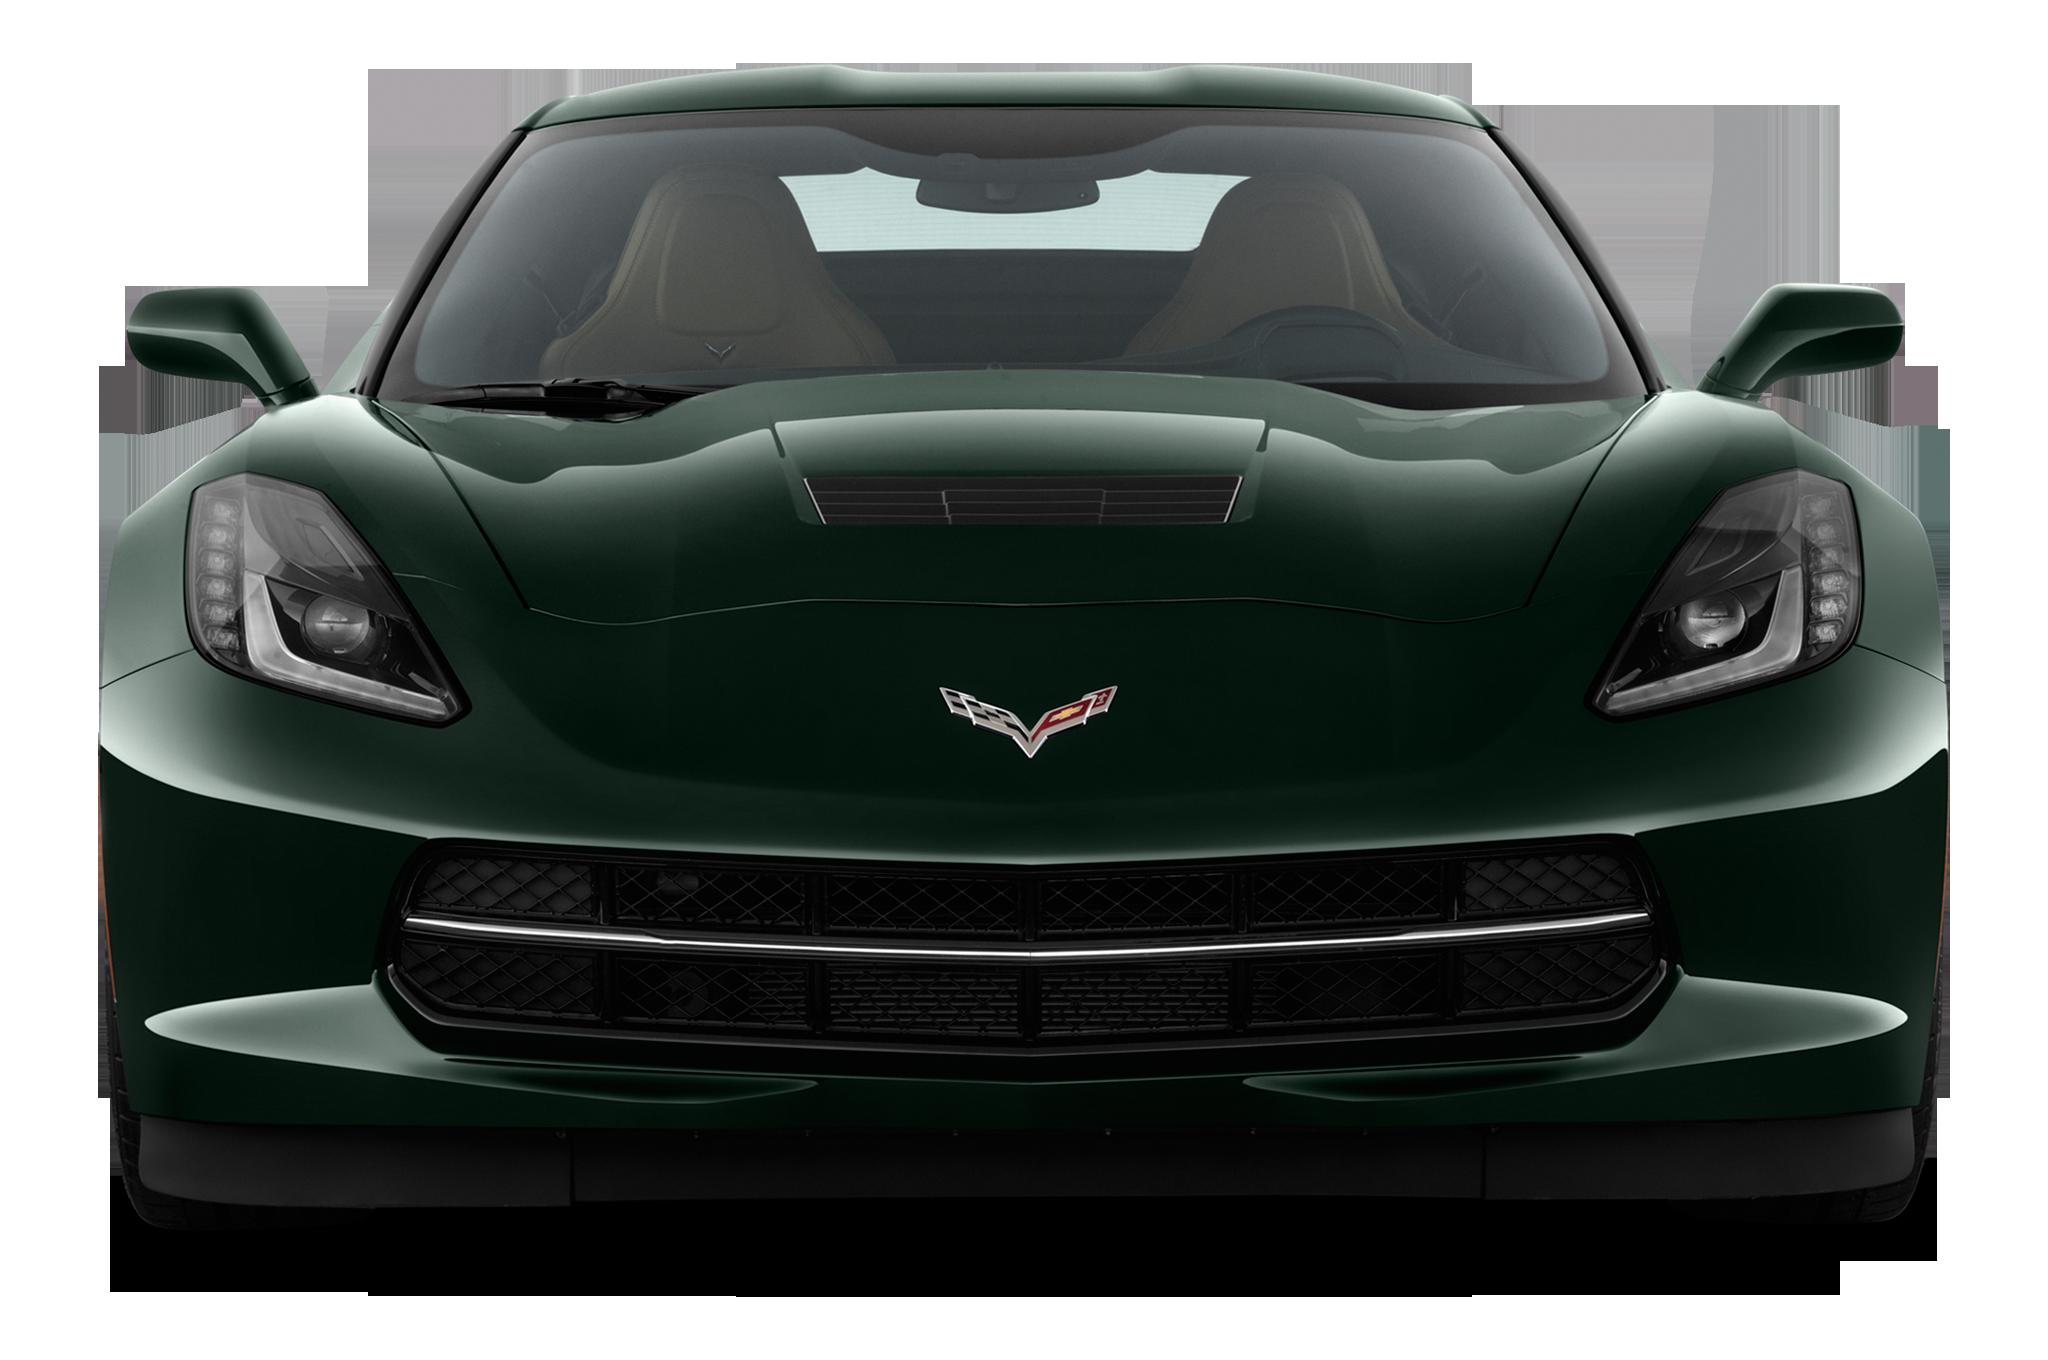 2017 Chevrolet Corvette Grand Sport Bridges C7 Stingray And Z06